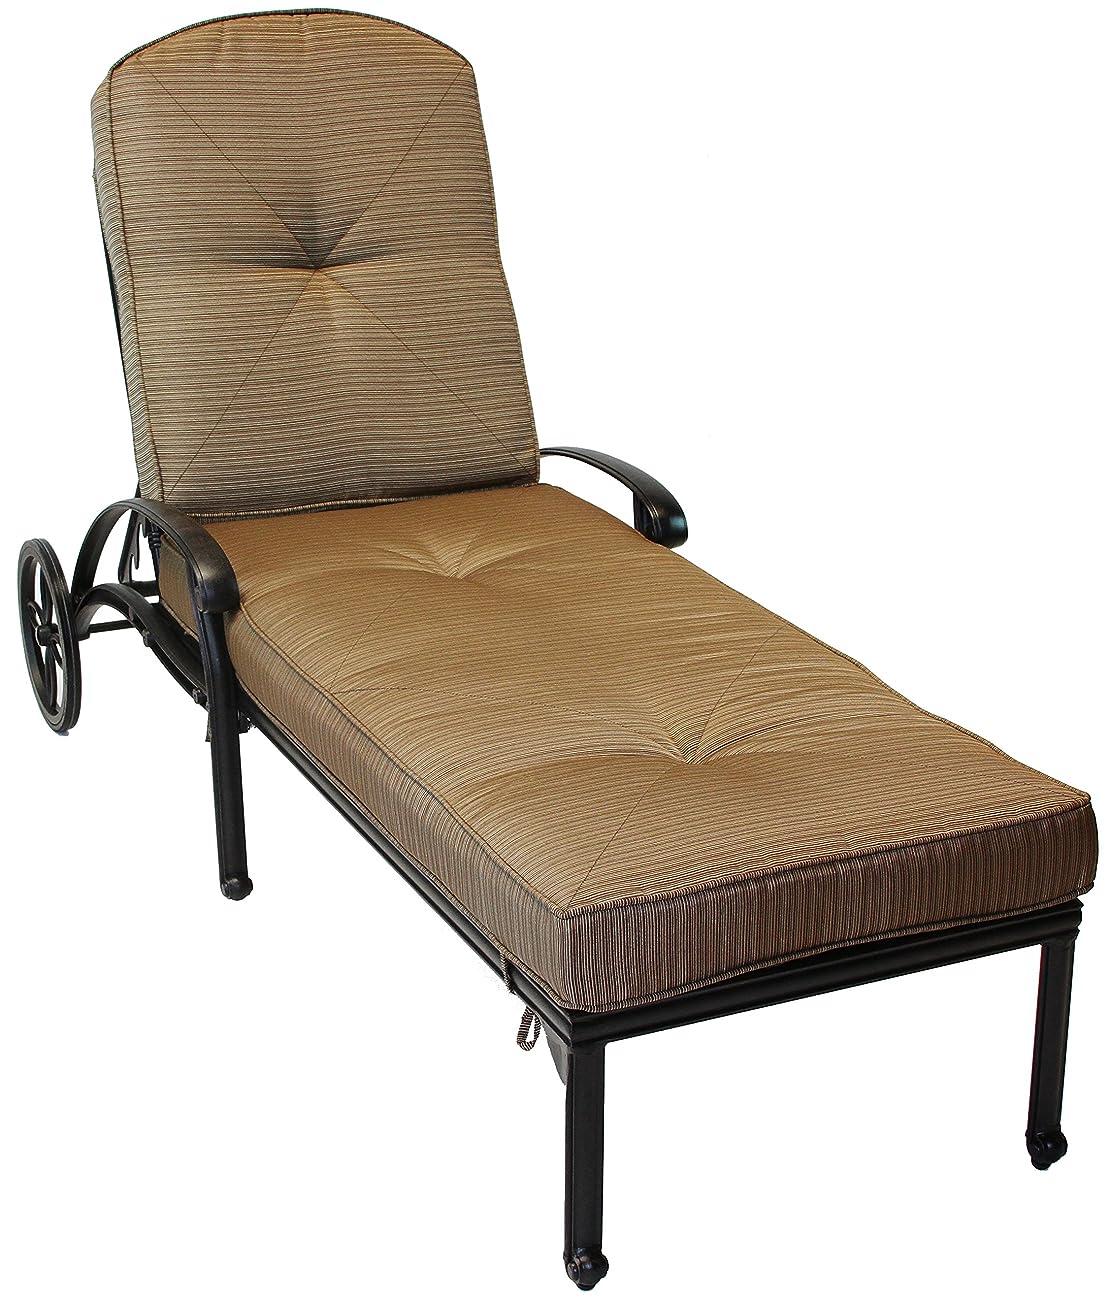 Heritage Outdoor Living Nassau Cast Aluminum Chaise lounge - Antique Bronze 1